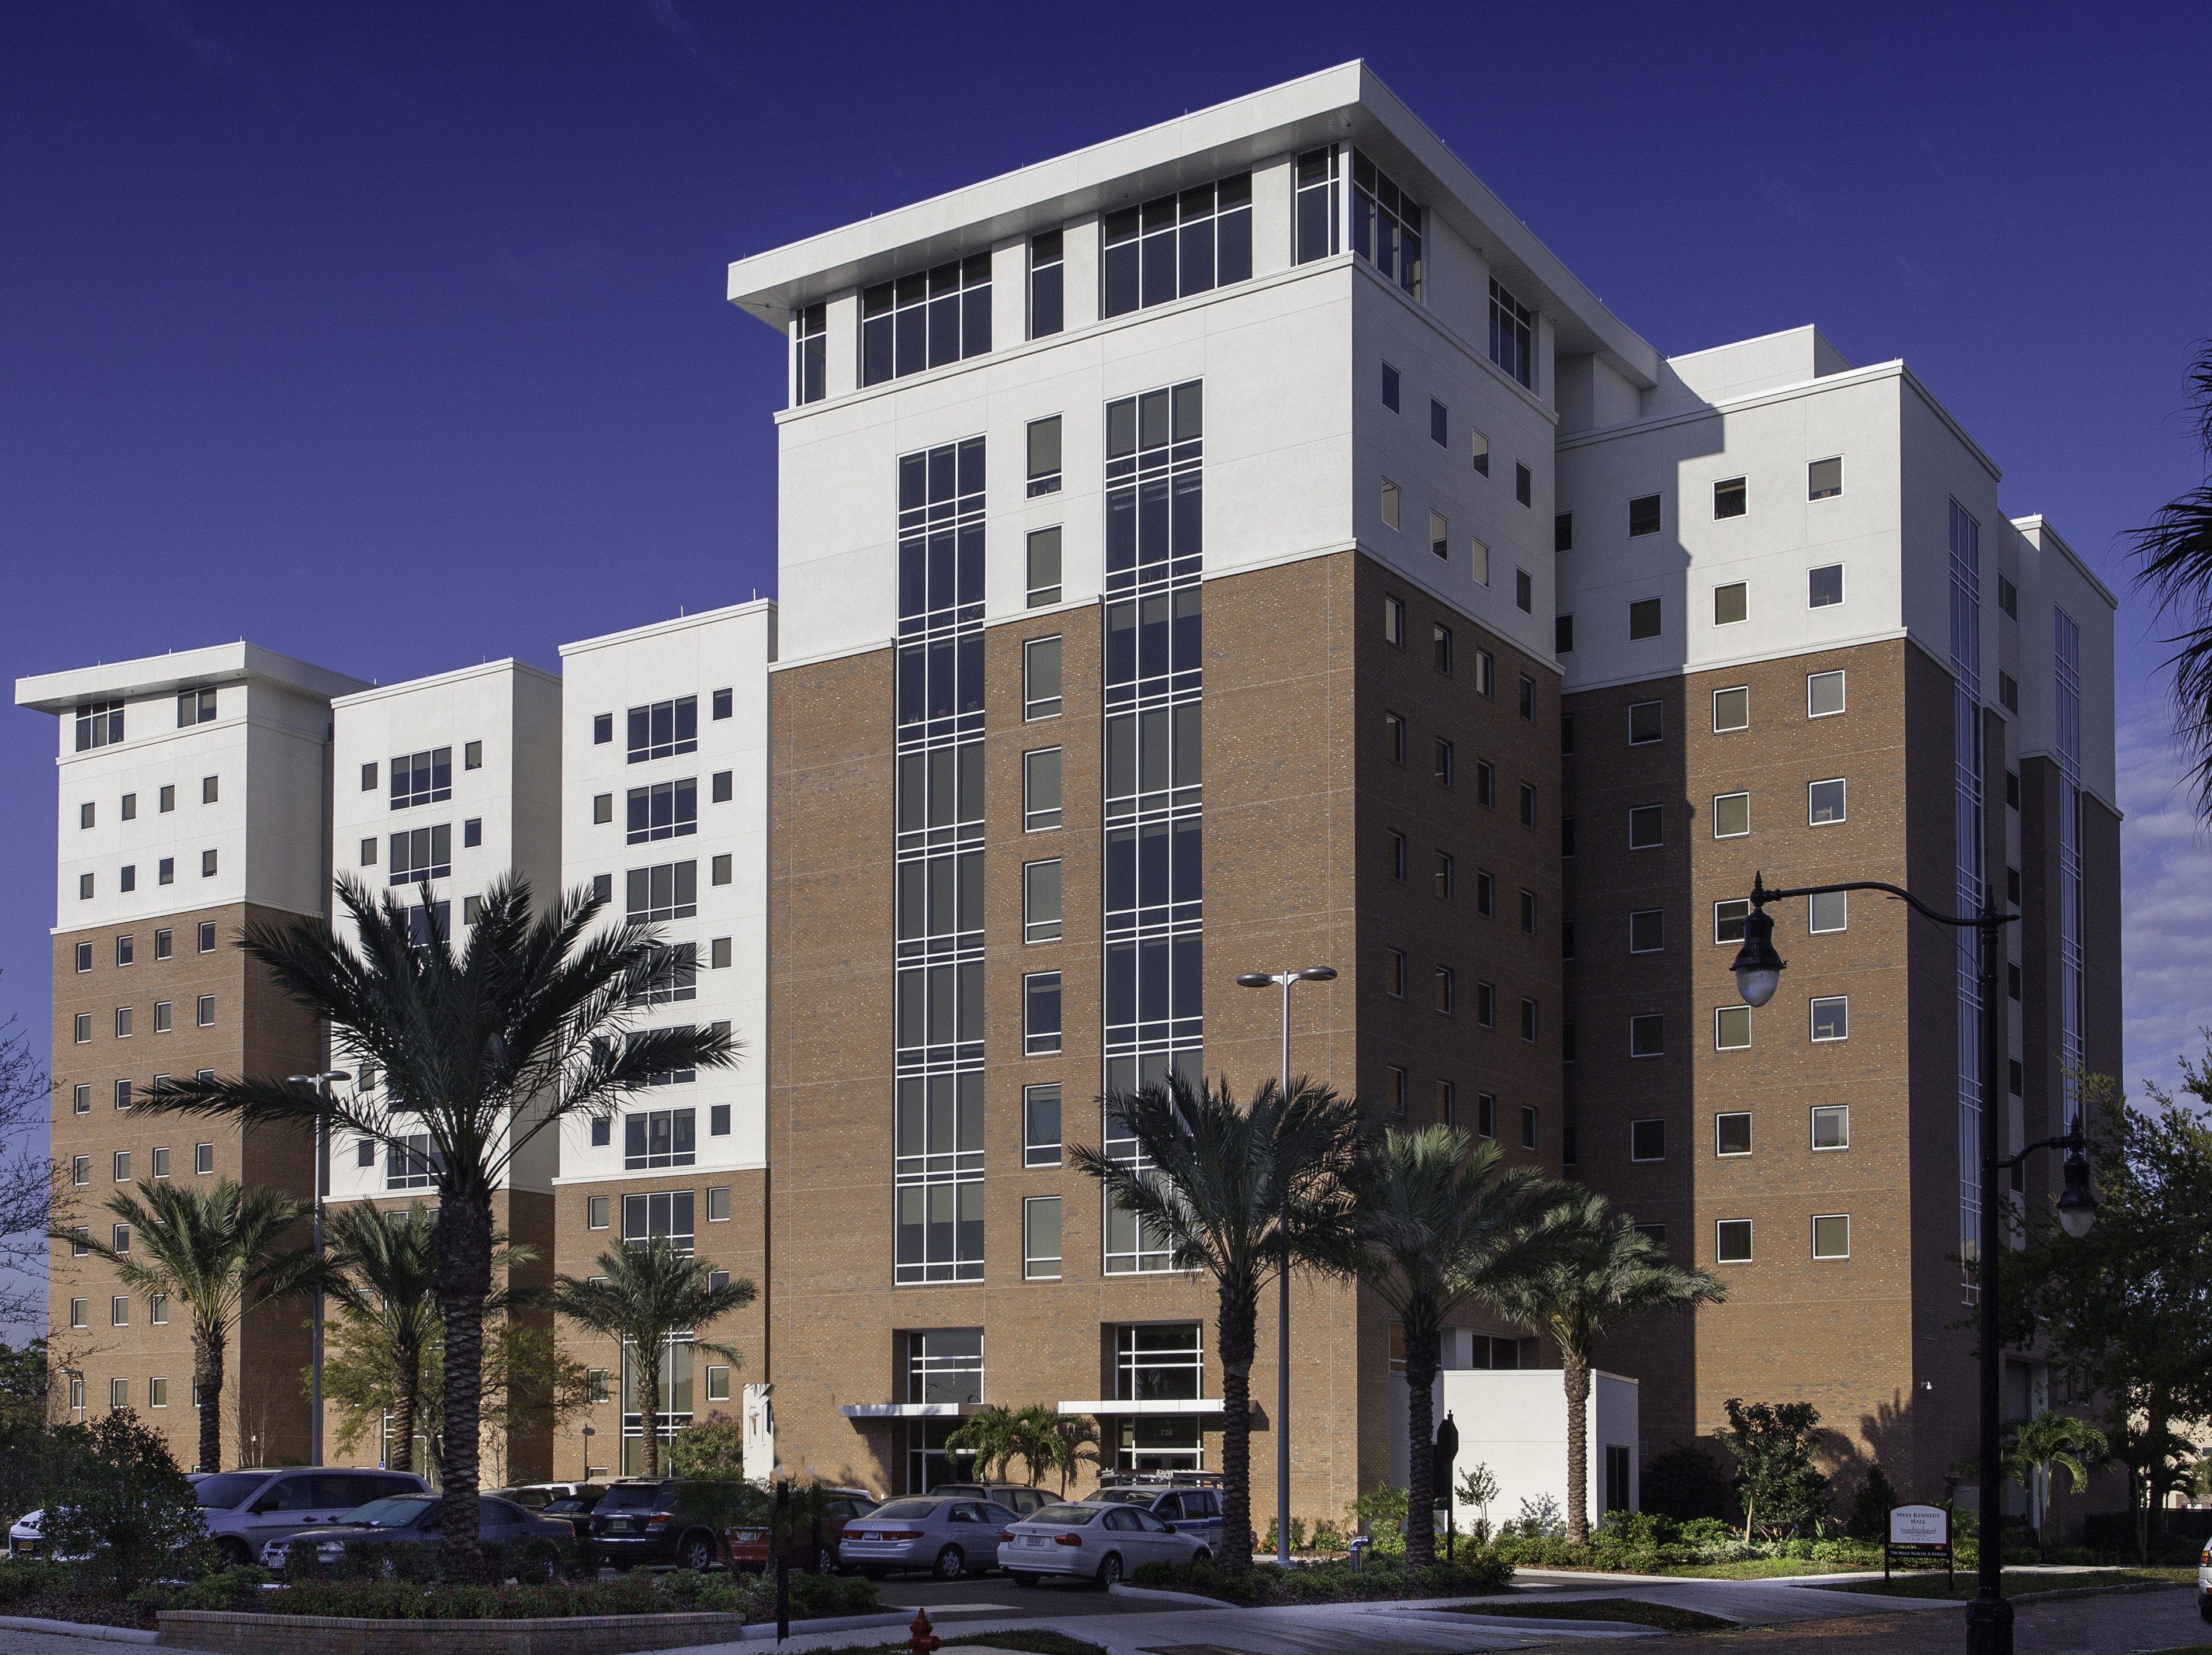 University of Tampa Residence Hall #7